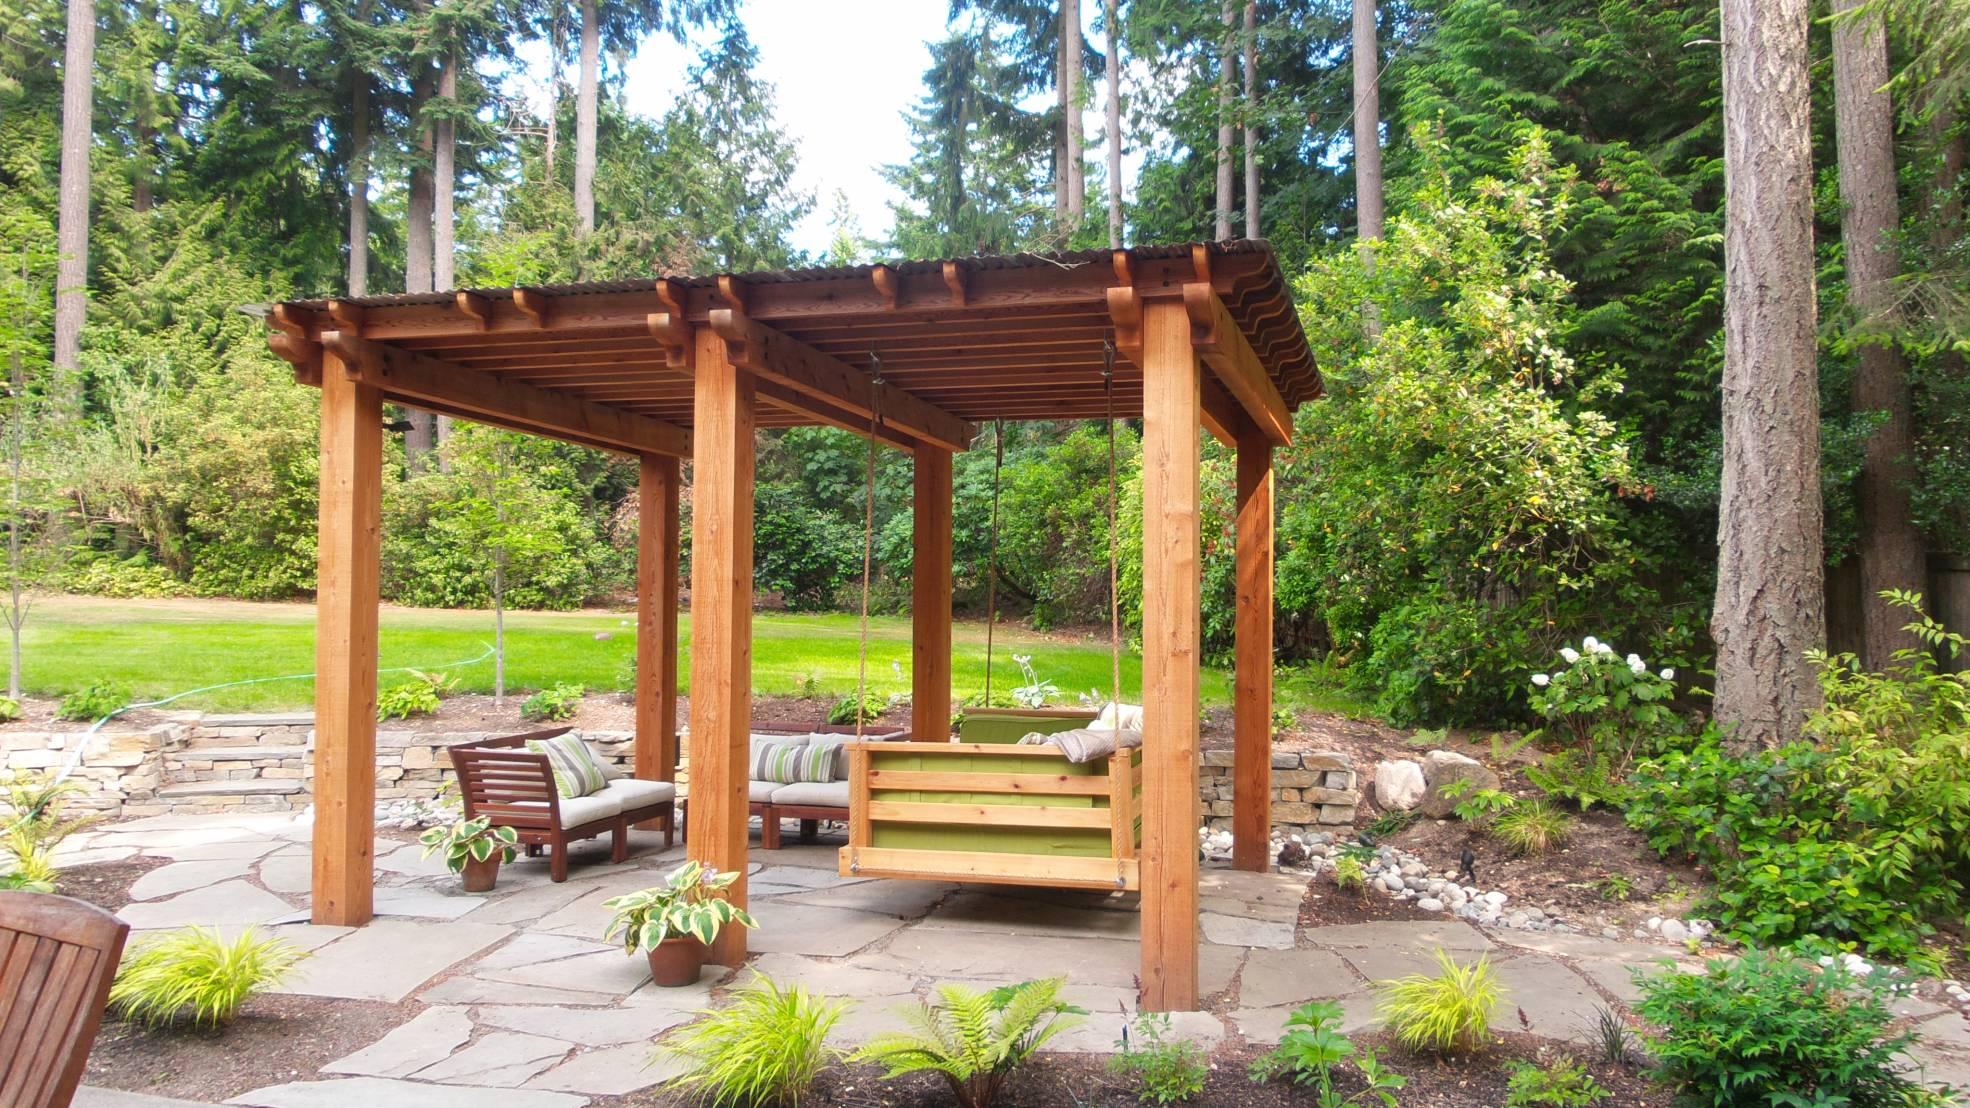 woodinville shade structure sublime garden design landscape